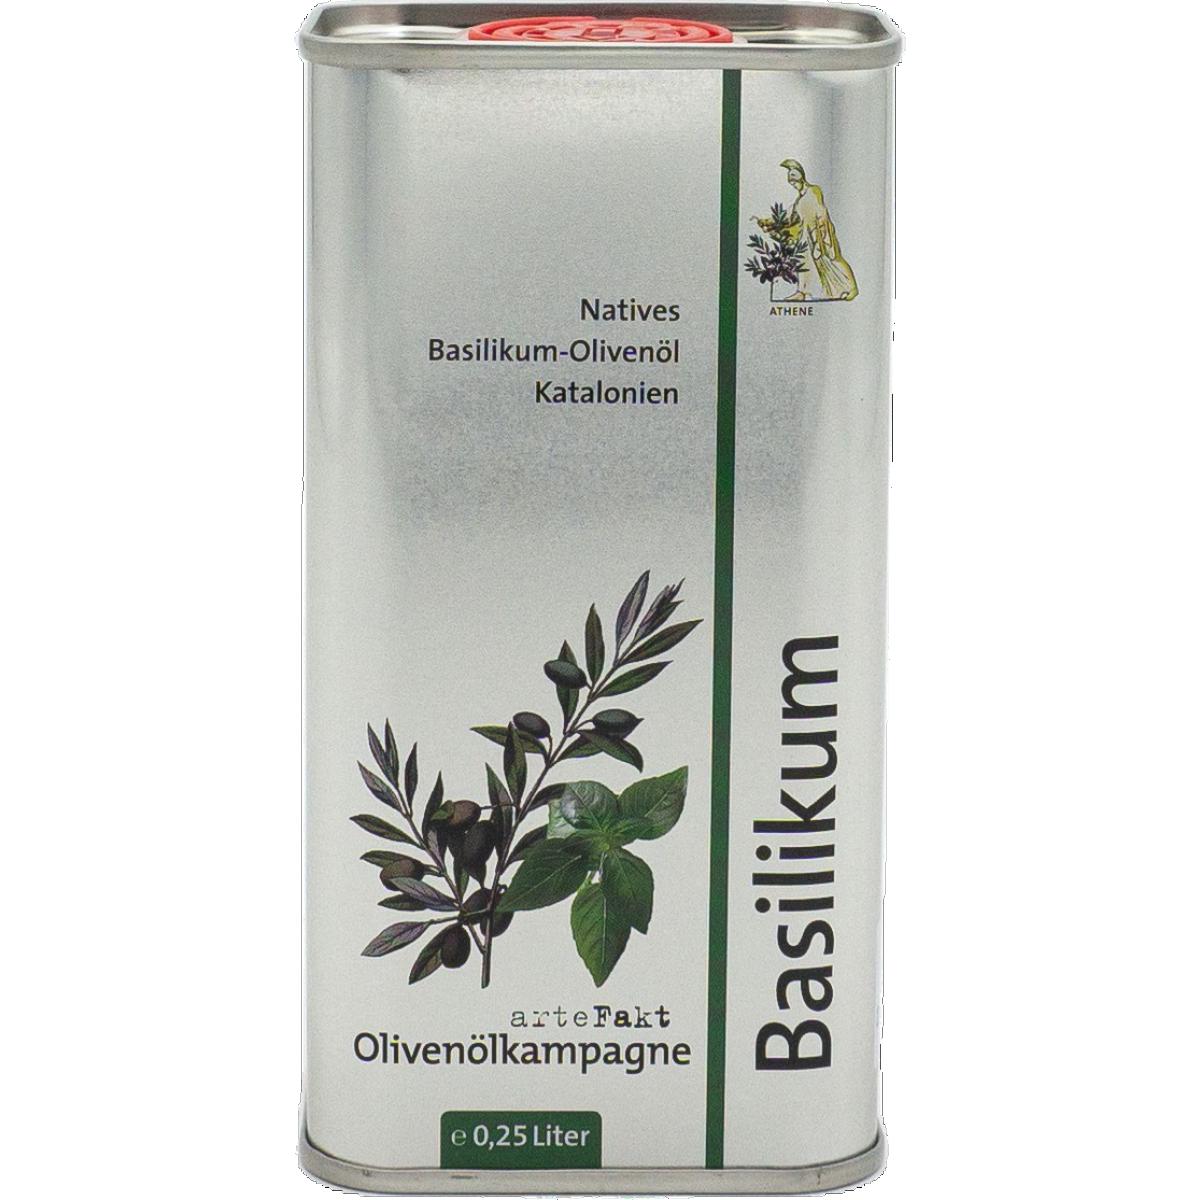 Bio Basilikum-Olivenöl, nativ